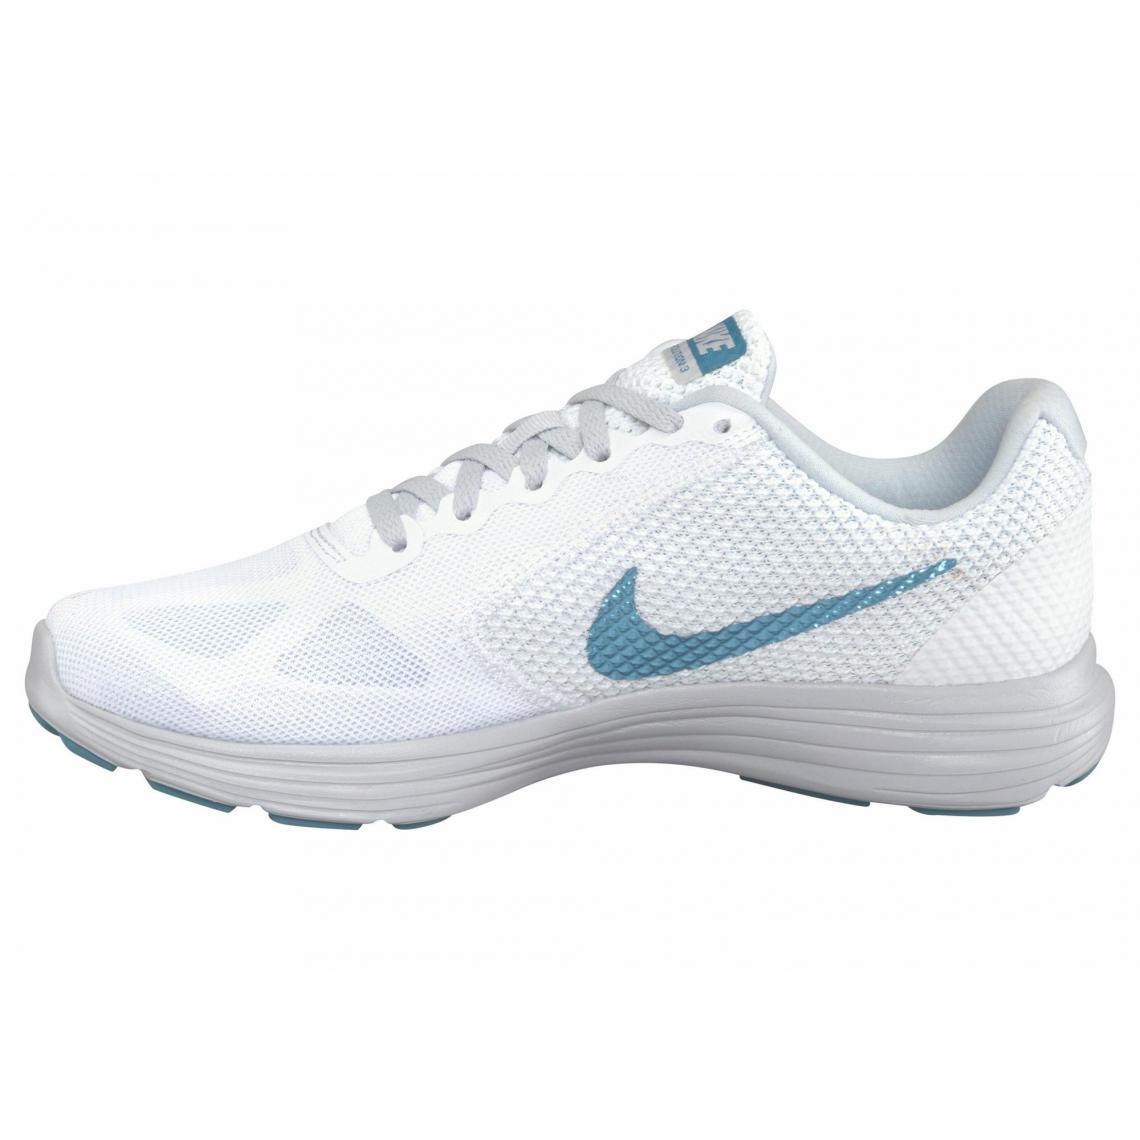 De Nike Wmns Femme 3 Blanc Révolution Chaussures Running Suisses yN0vnOm8w